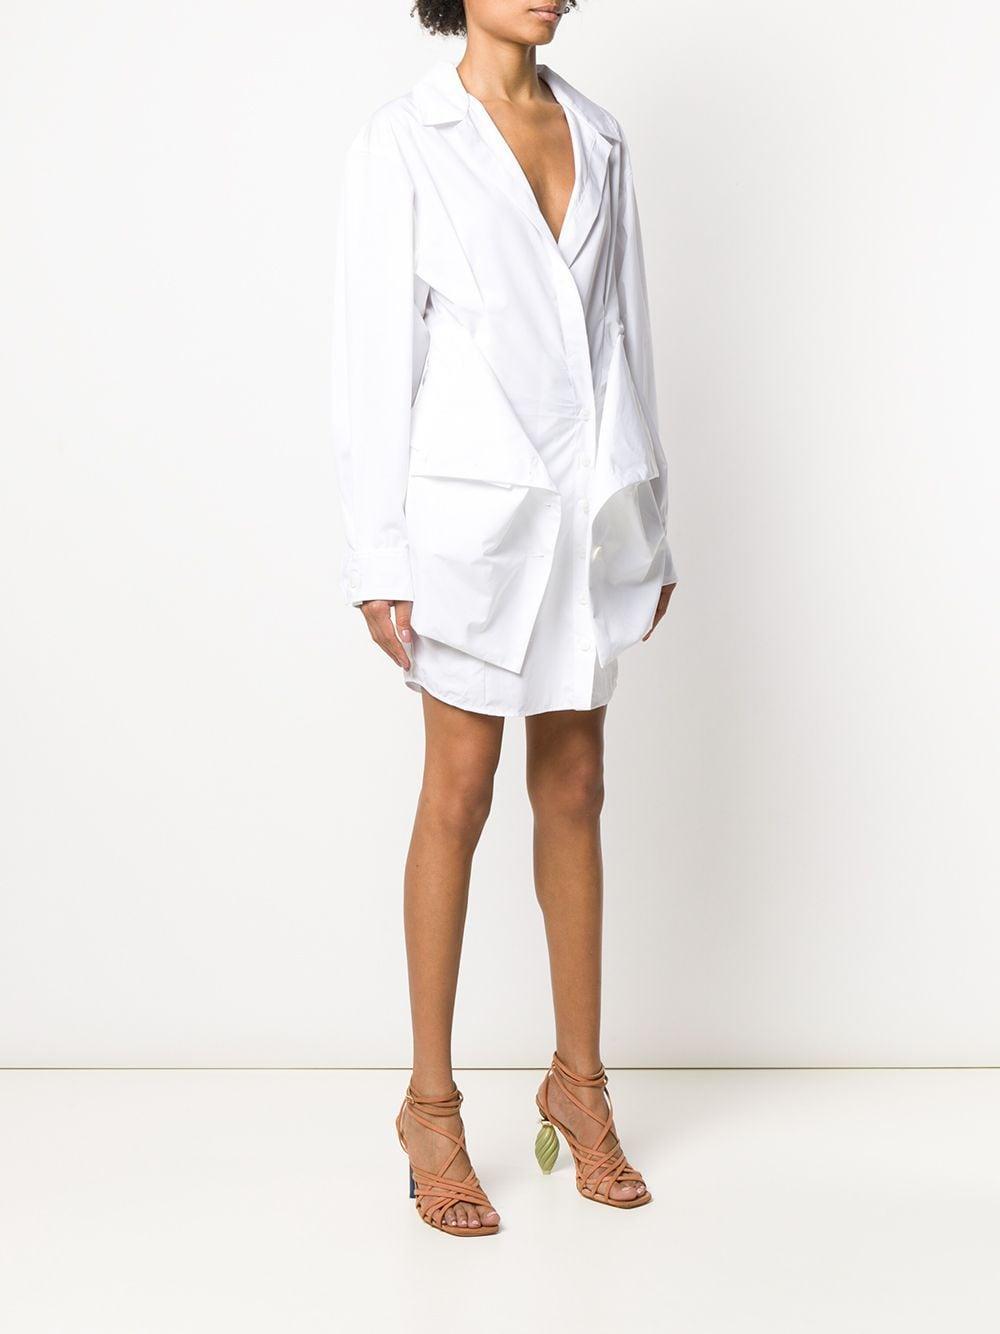 La Robe Murano Coton Jacquemus en coloris Blanc